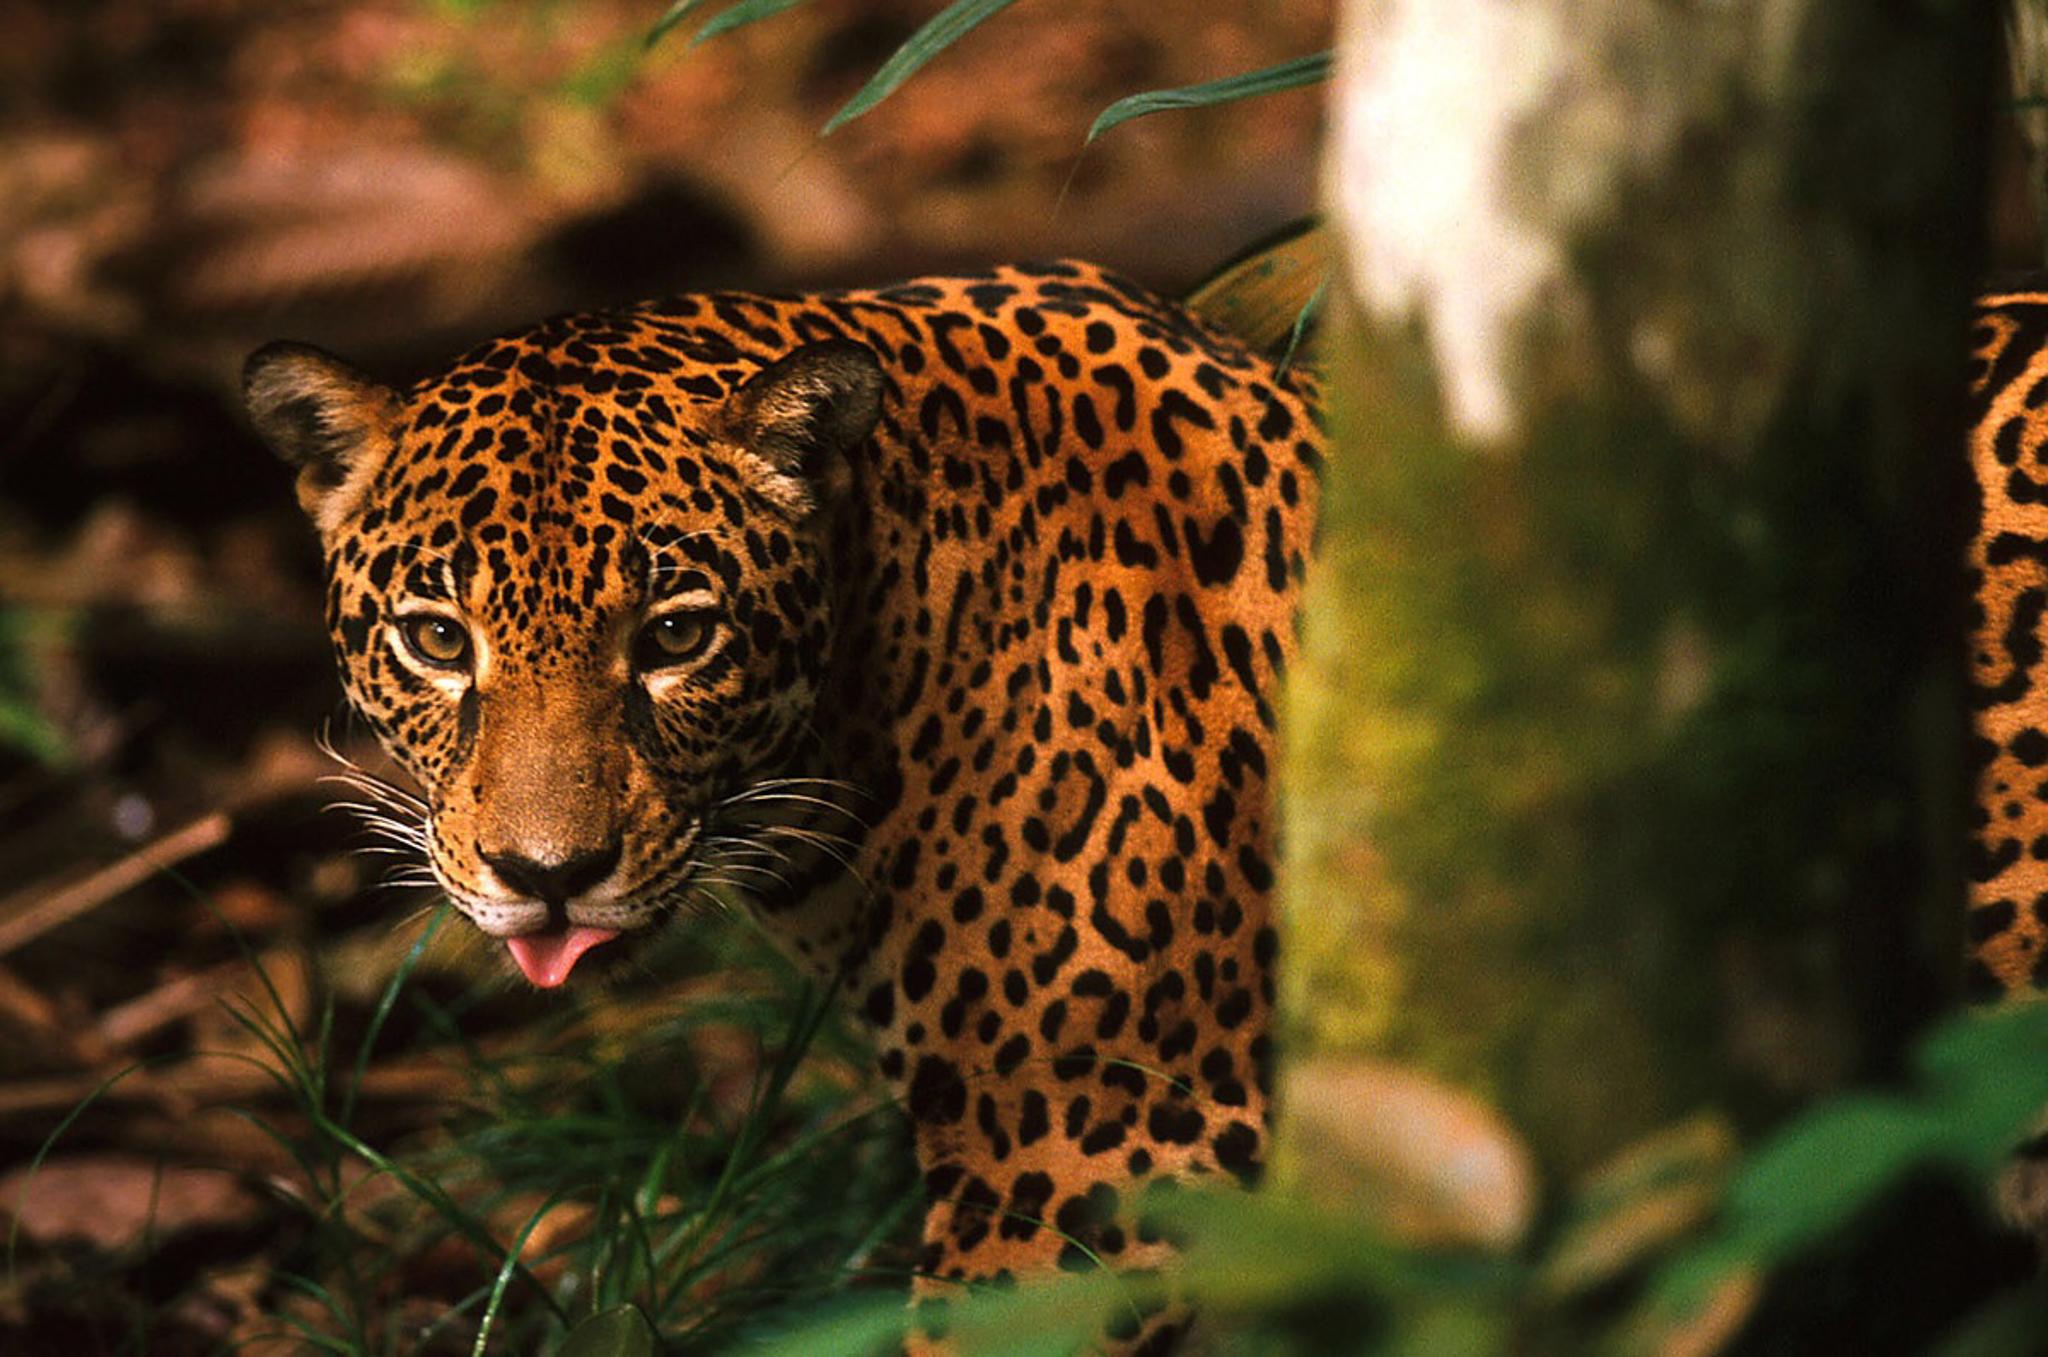 A jaguar (<em>Panthera onca</em>) in the Brazilian Amazon. Photograph by Rodrigo Baleia